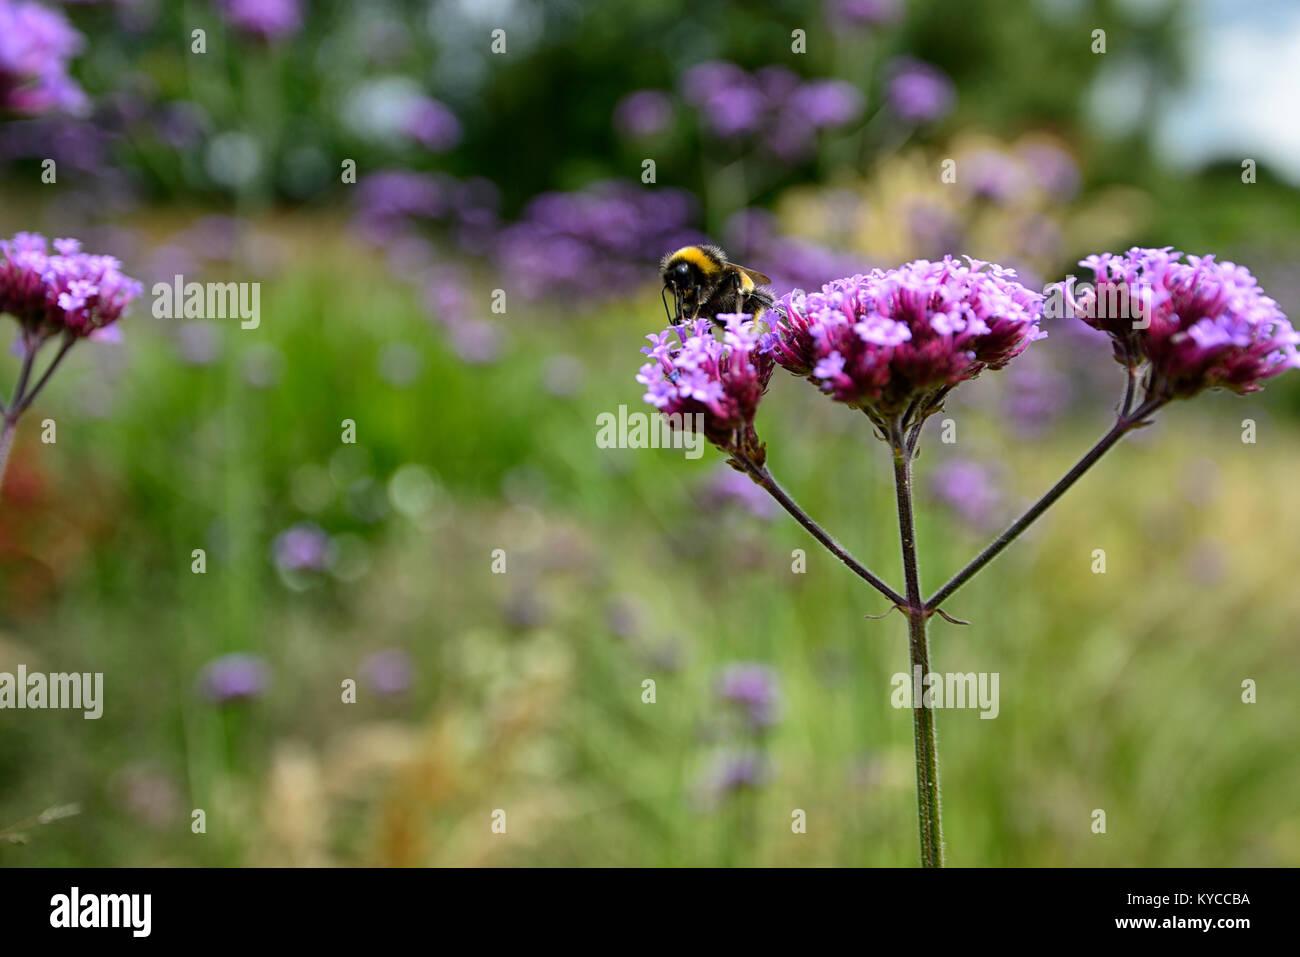 bee,feed,feeding,bee-friendly,verbena bonariensis,tall,perennial,purple,flower,flowers, wildlife,insect,friendly,planting,RM Stock Photo